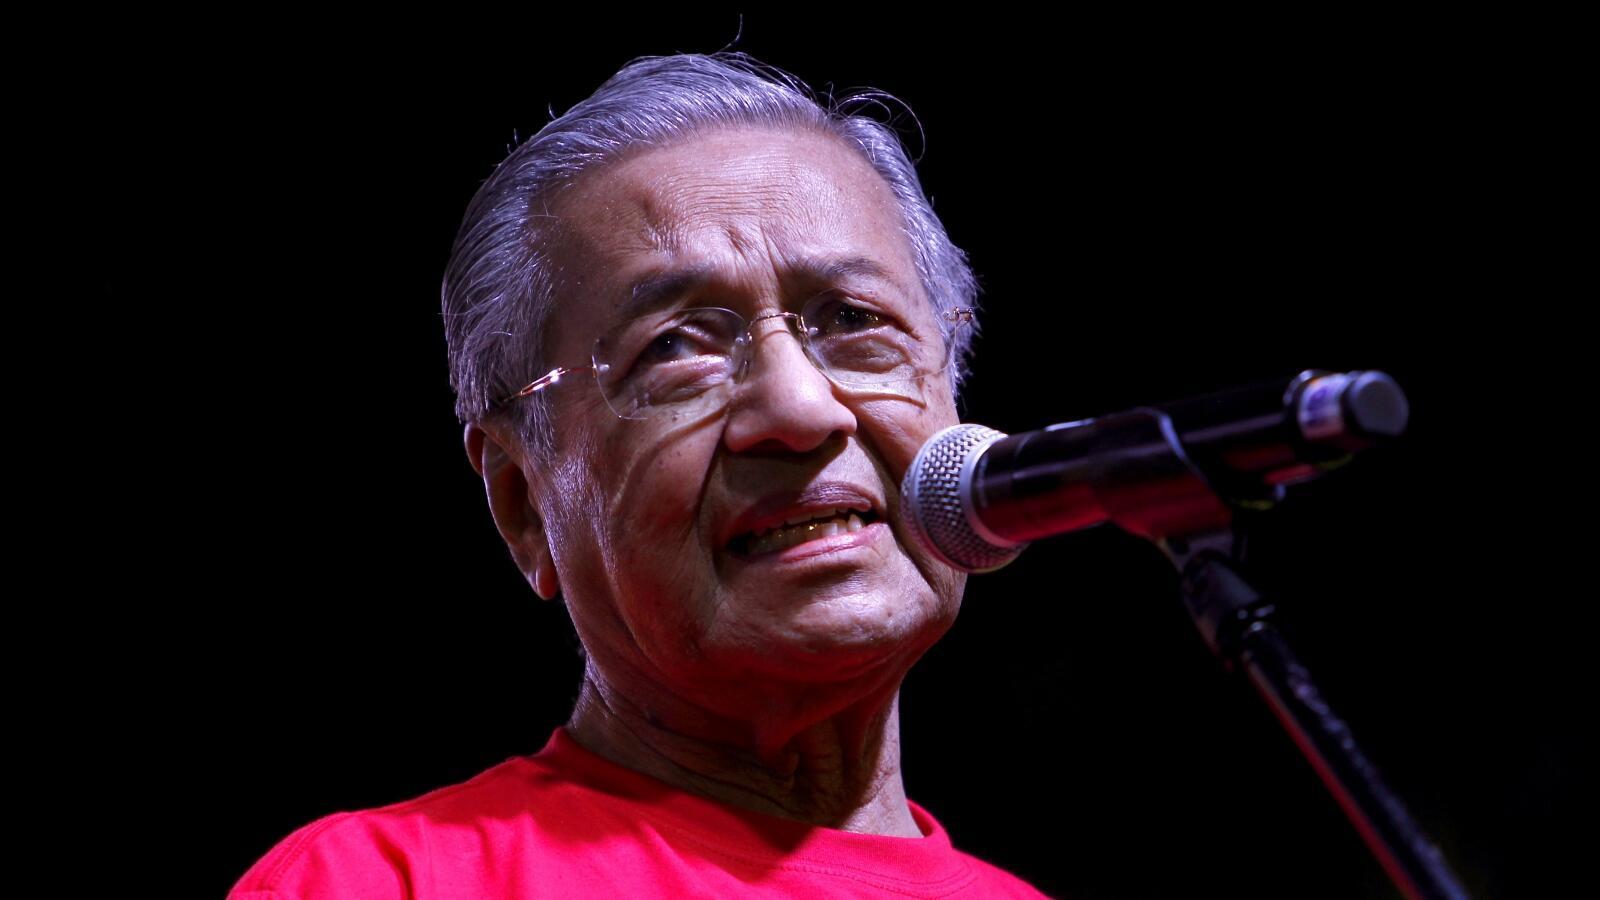 Wakil PM Malaysia: Mahatir Mohamad Seharusnya Urus Cucu Saja